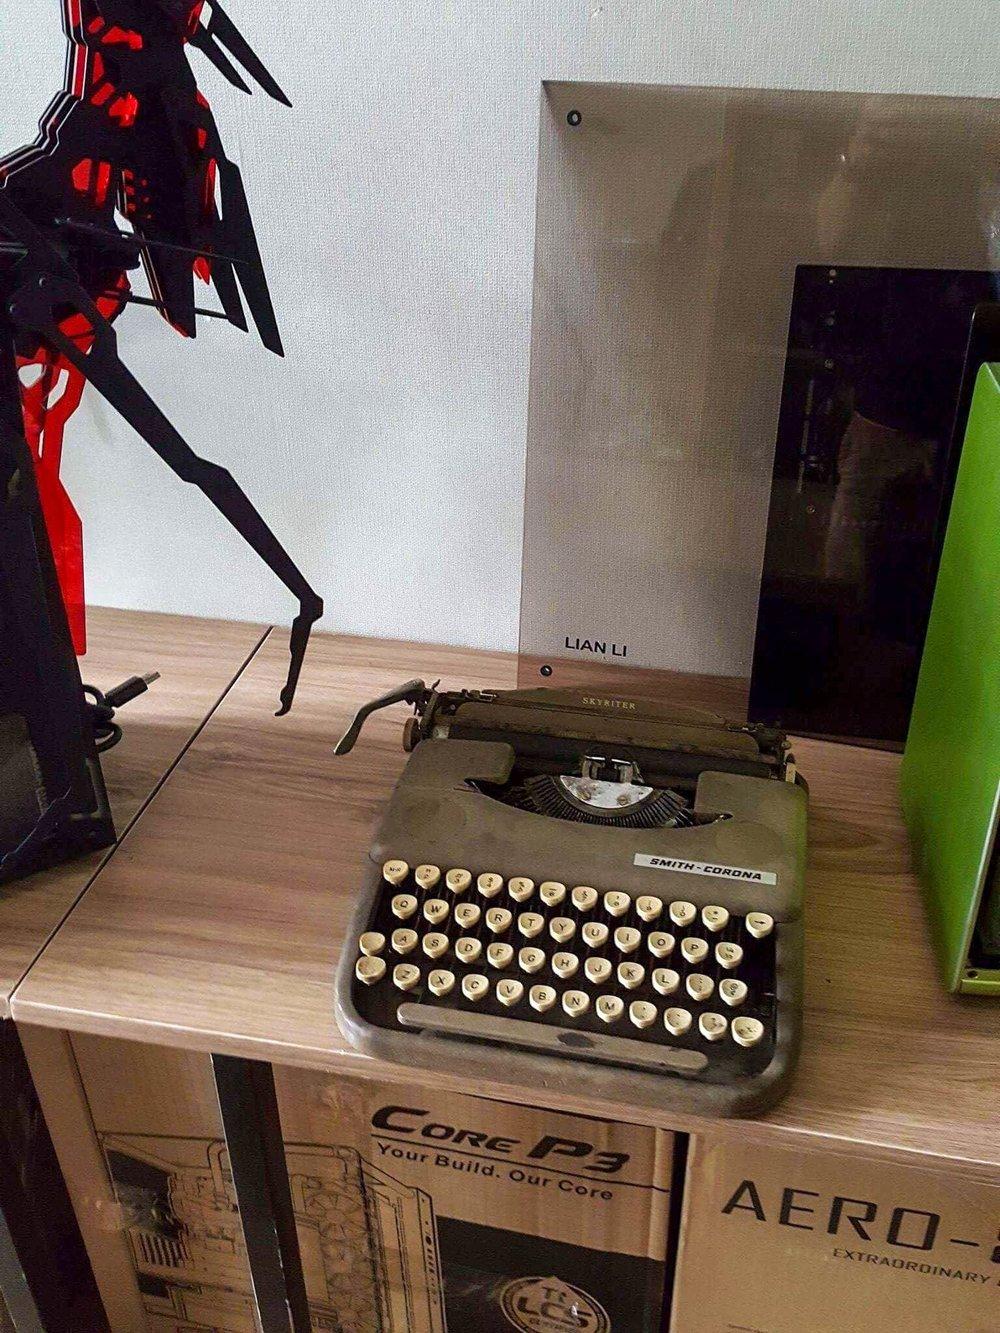 jellykey-typewriter-artisan-keycap-3.jpg